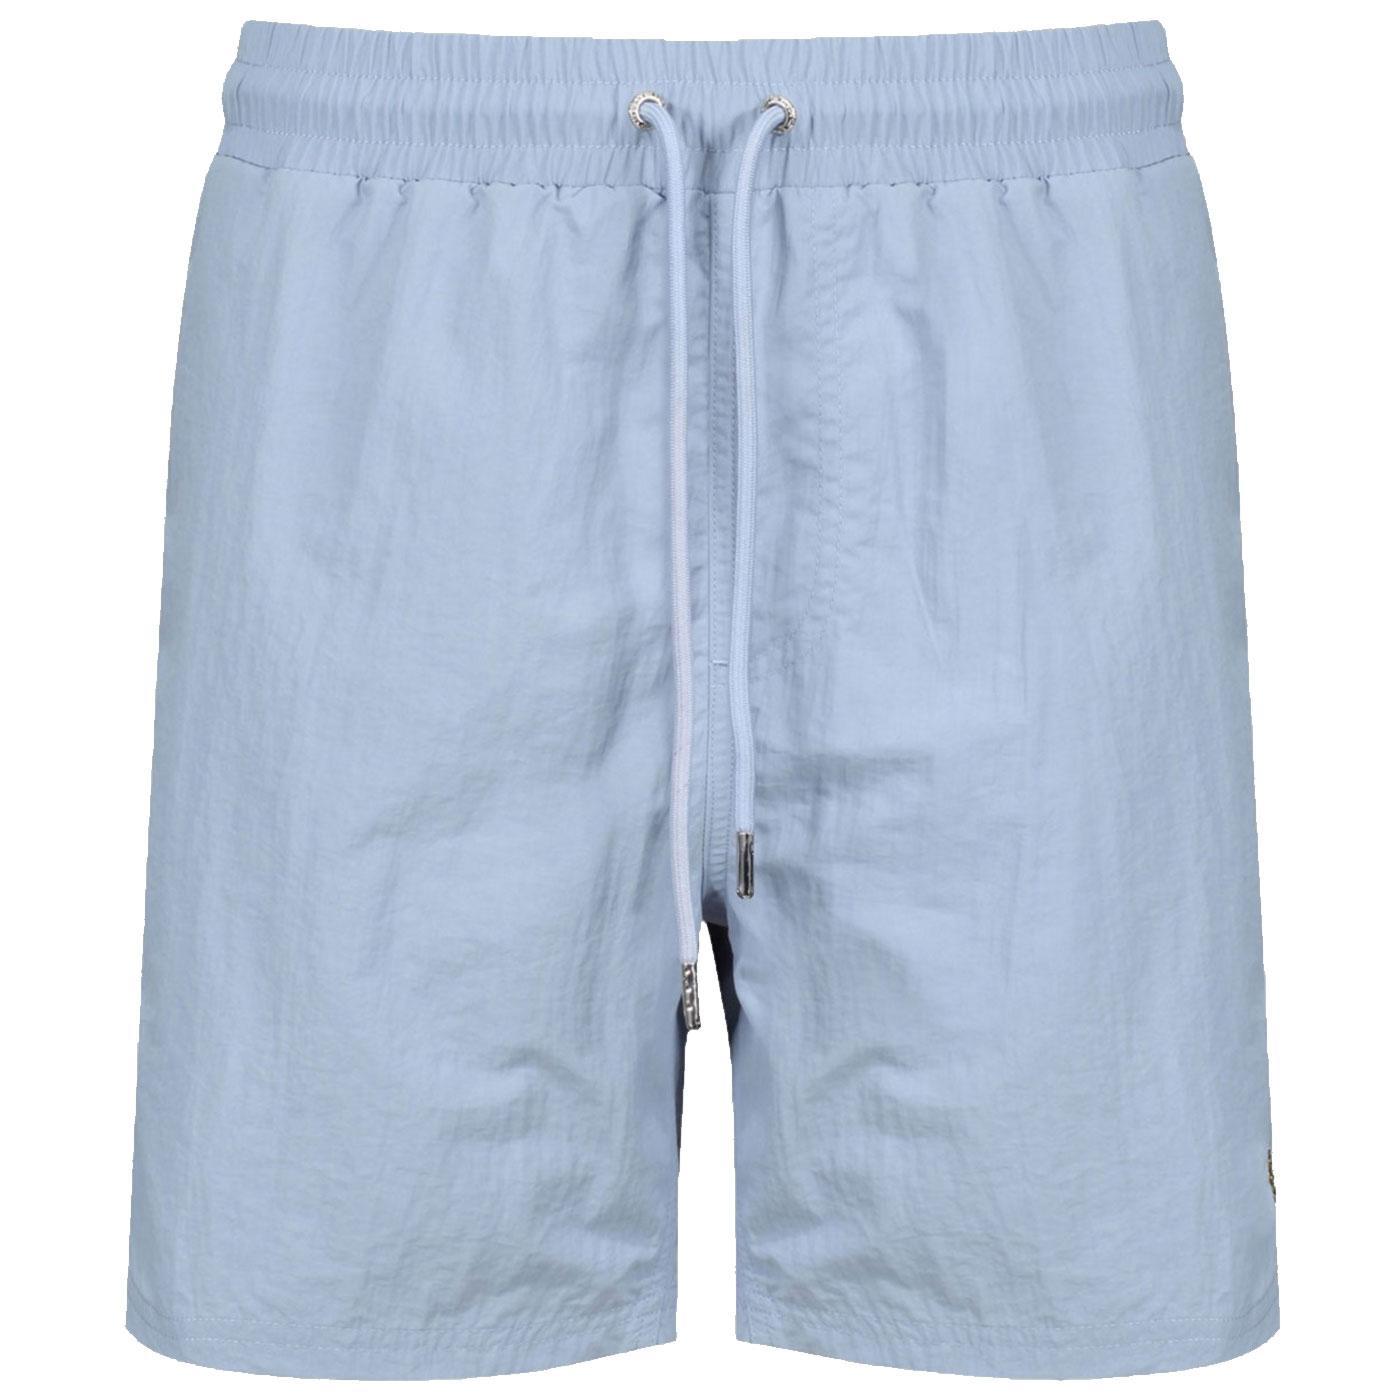 Great LUKE SPORT Mens Retro Swim Shorts SOFT SKY